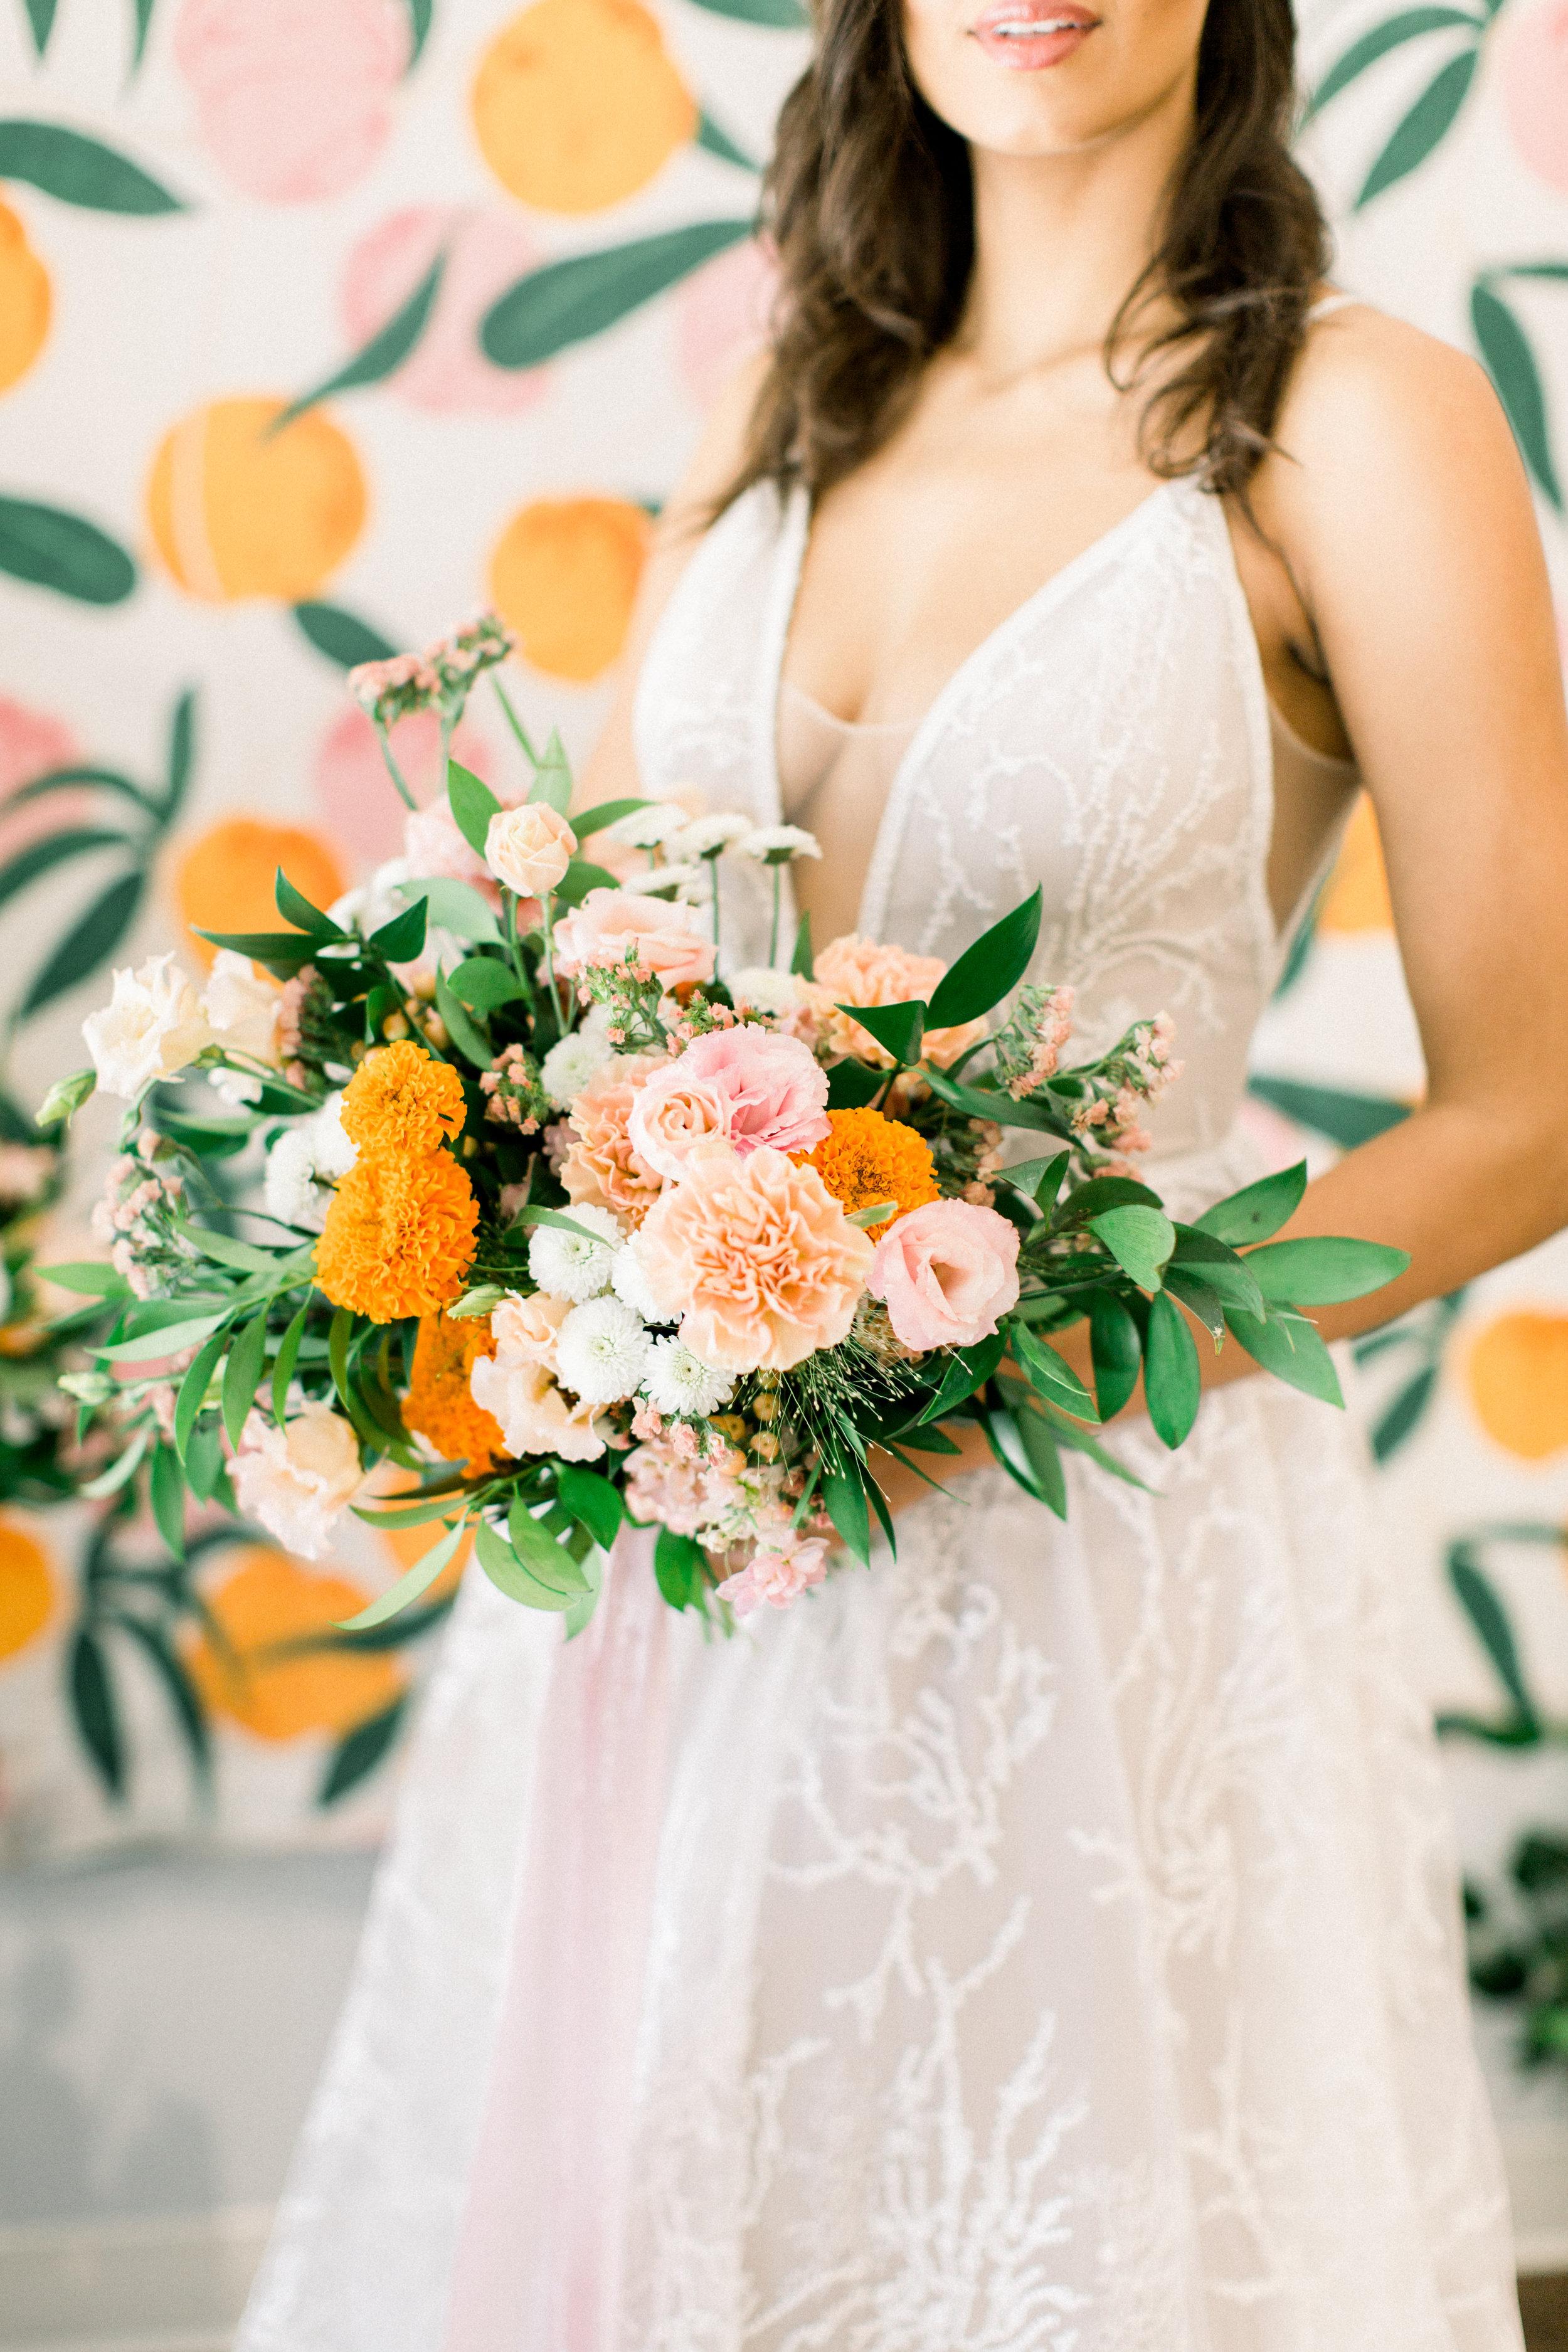 Bridal Gown Lookbook - Arizona florist Phoenix Scottsdale Sedona - Orange and Pink Bridal Bouquet Inspiration - Citrus Wedding